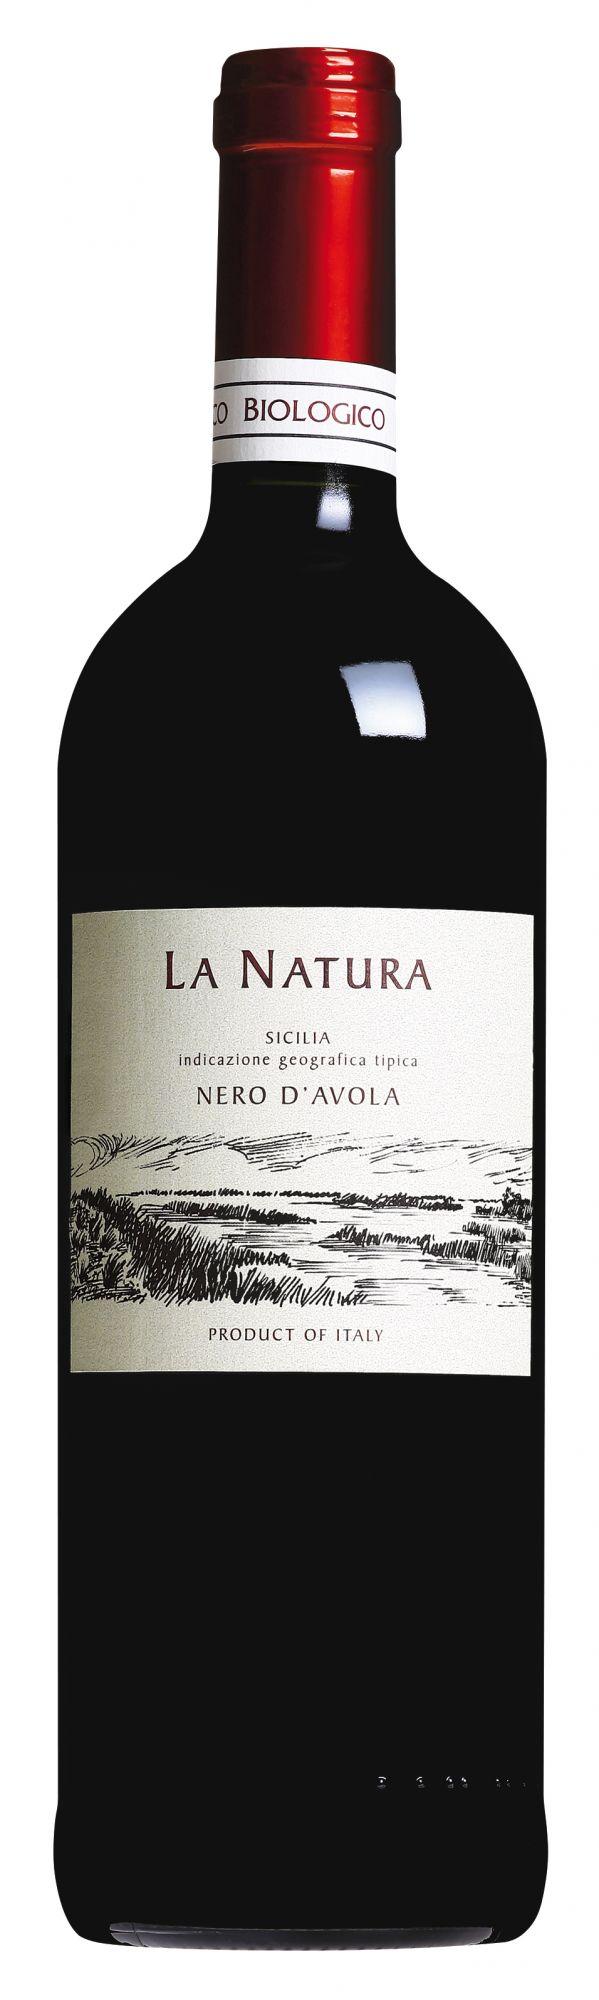 La Natura Sicilia Nero d'Avola